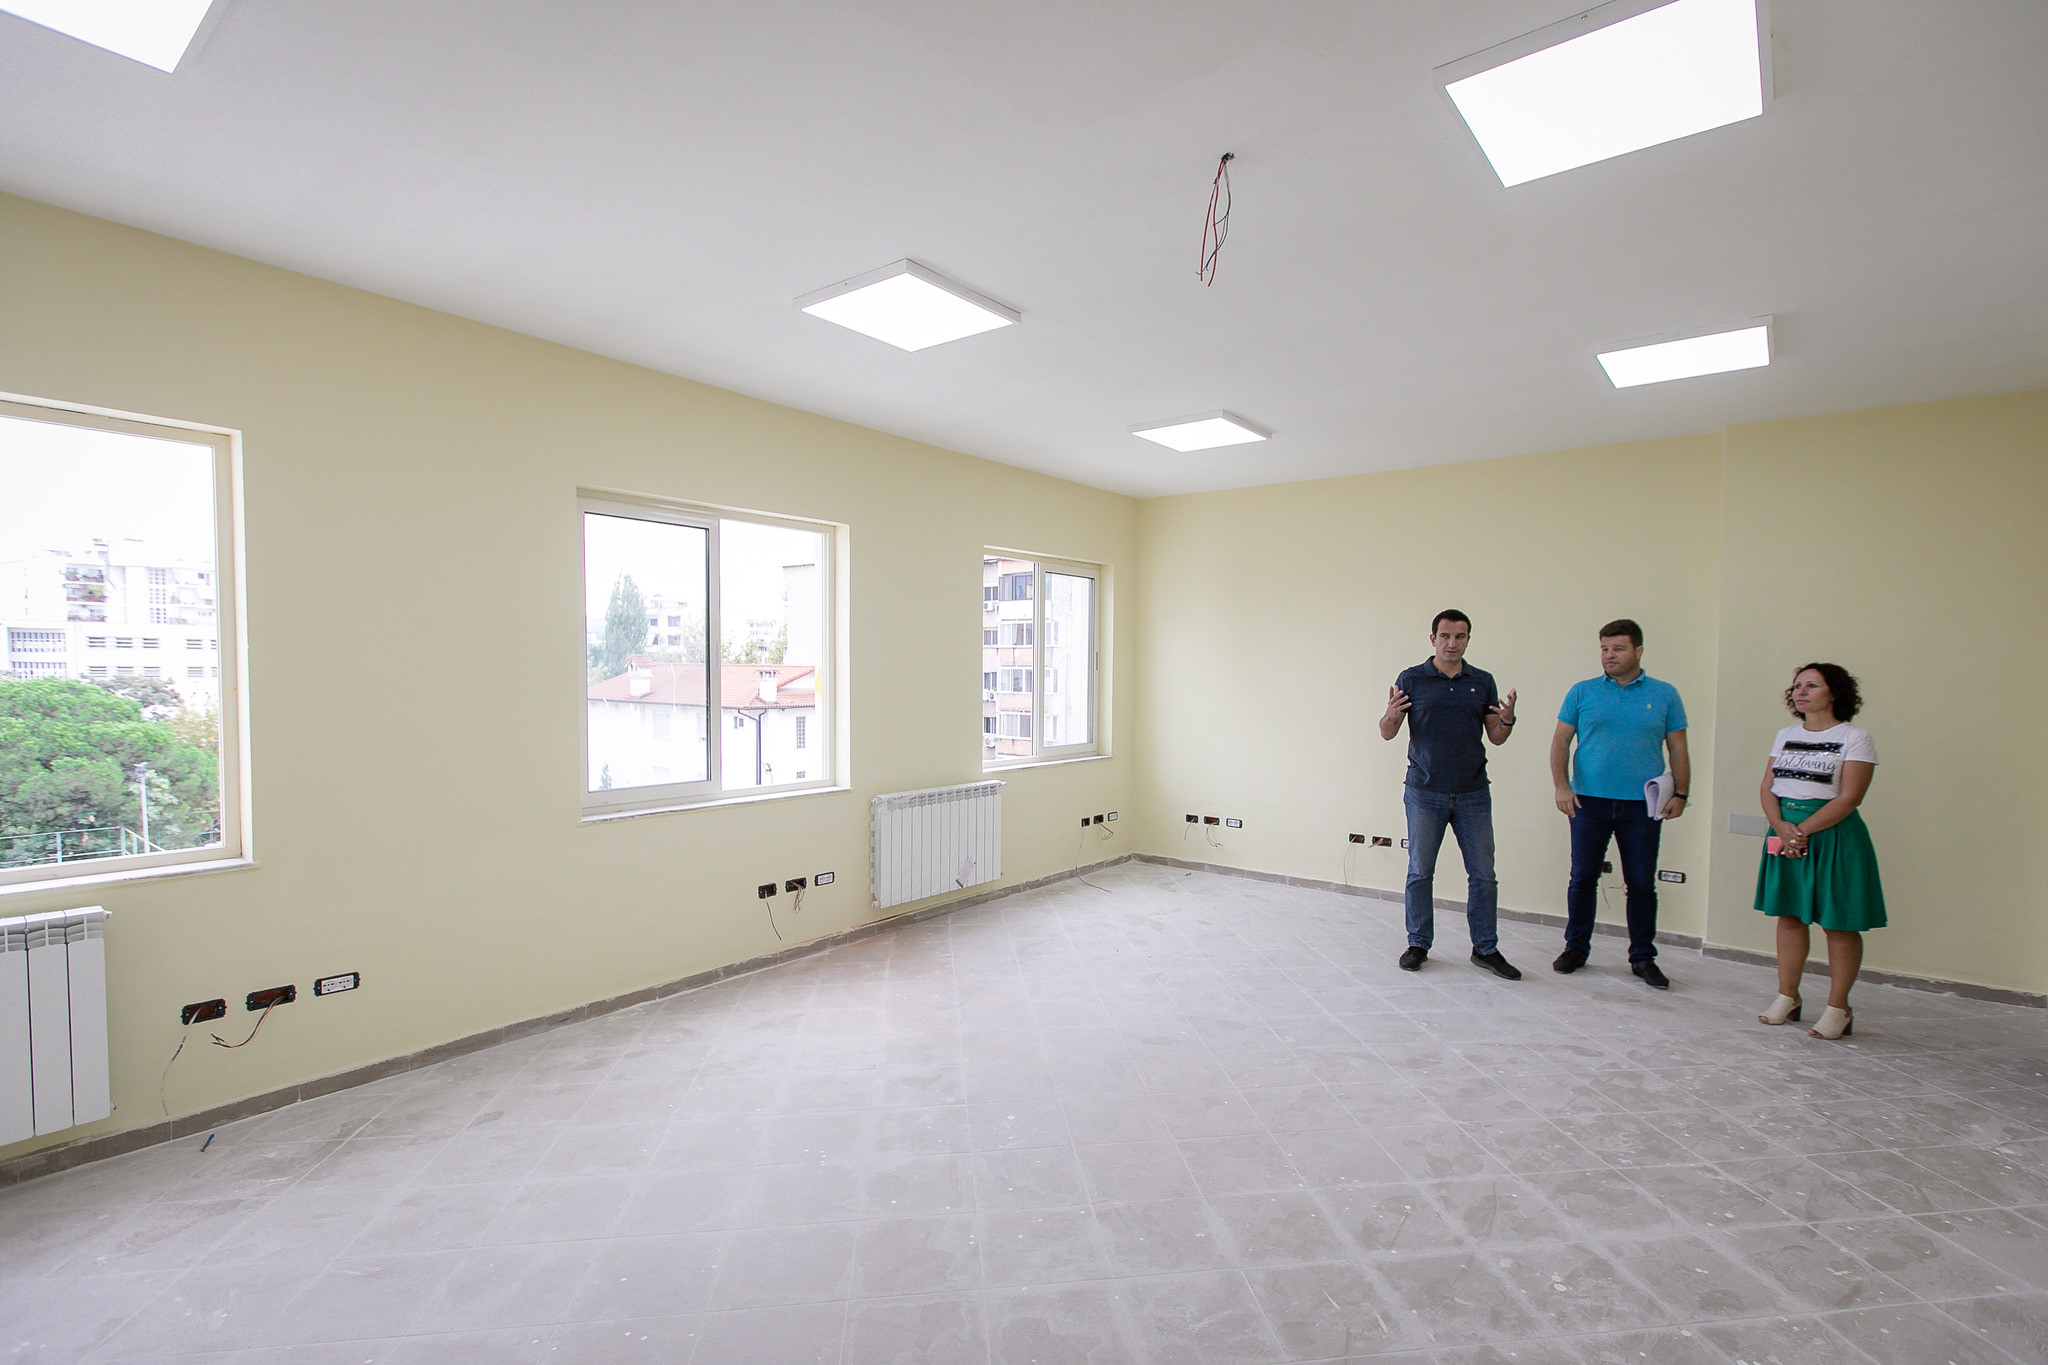 Veliaj gjate inspektimit te rikonstruksionit te shkolles Ismail Qemali (4)